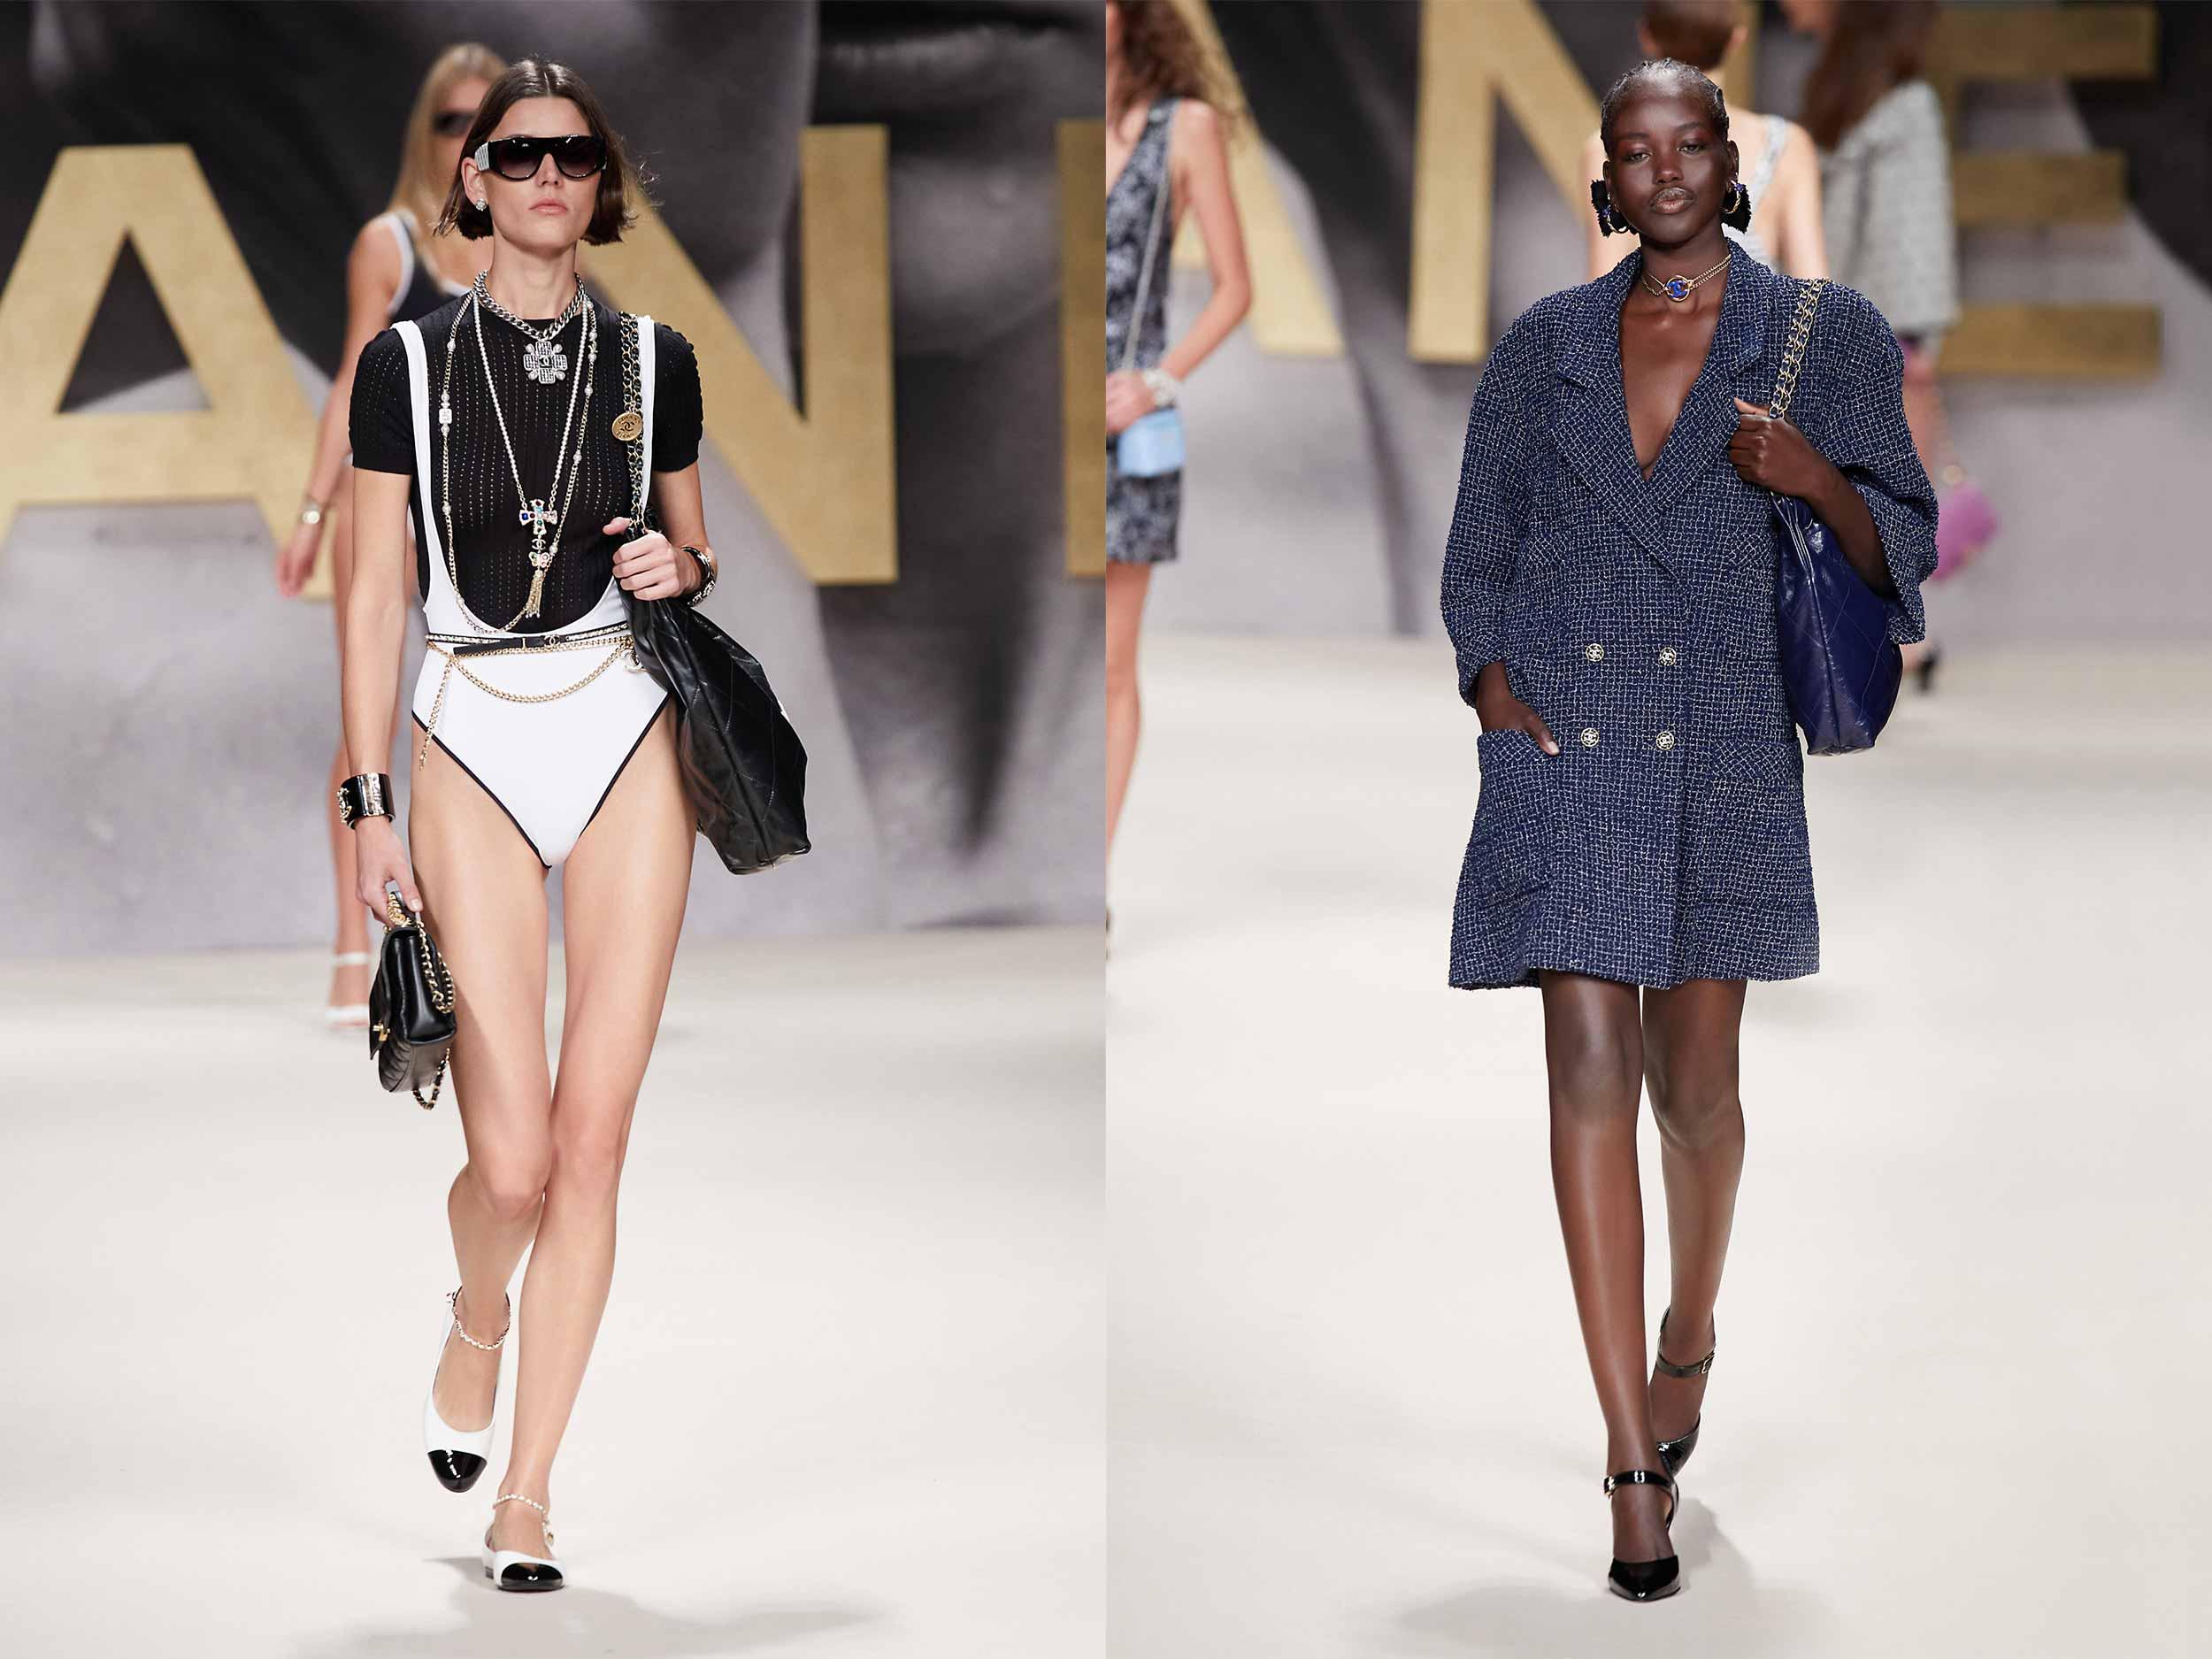 Chanel revives the '80s spirit for Spring/Summer 2022